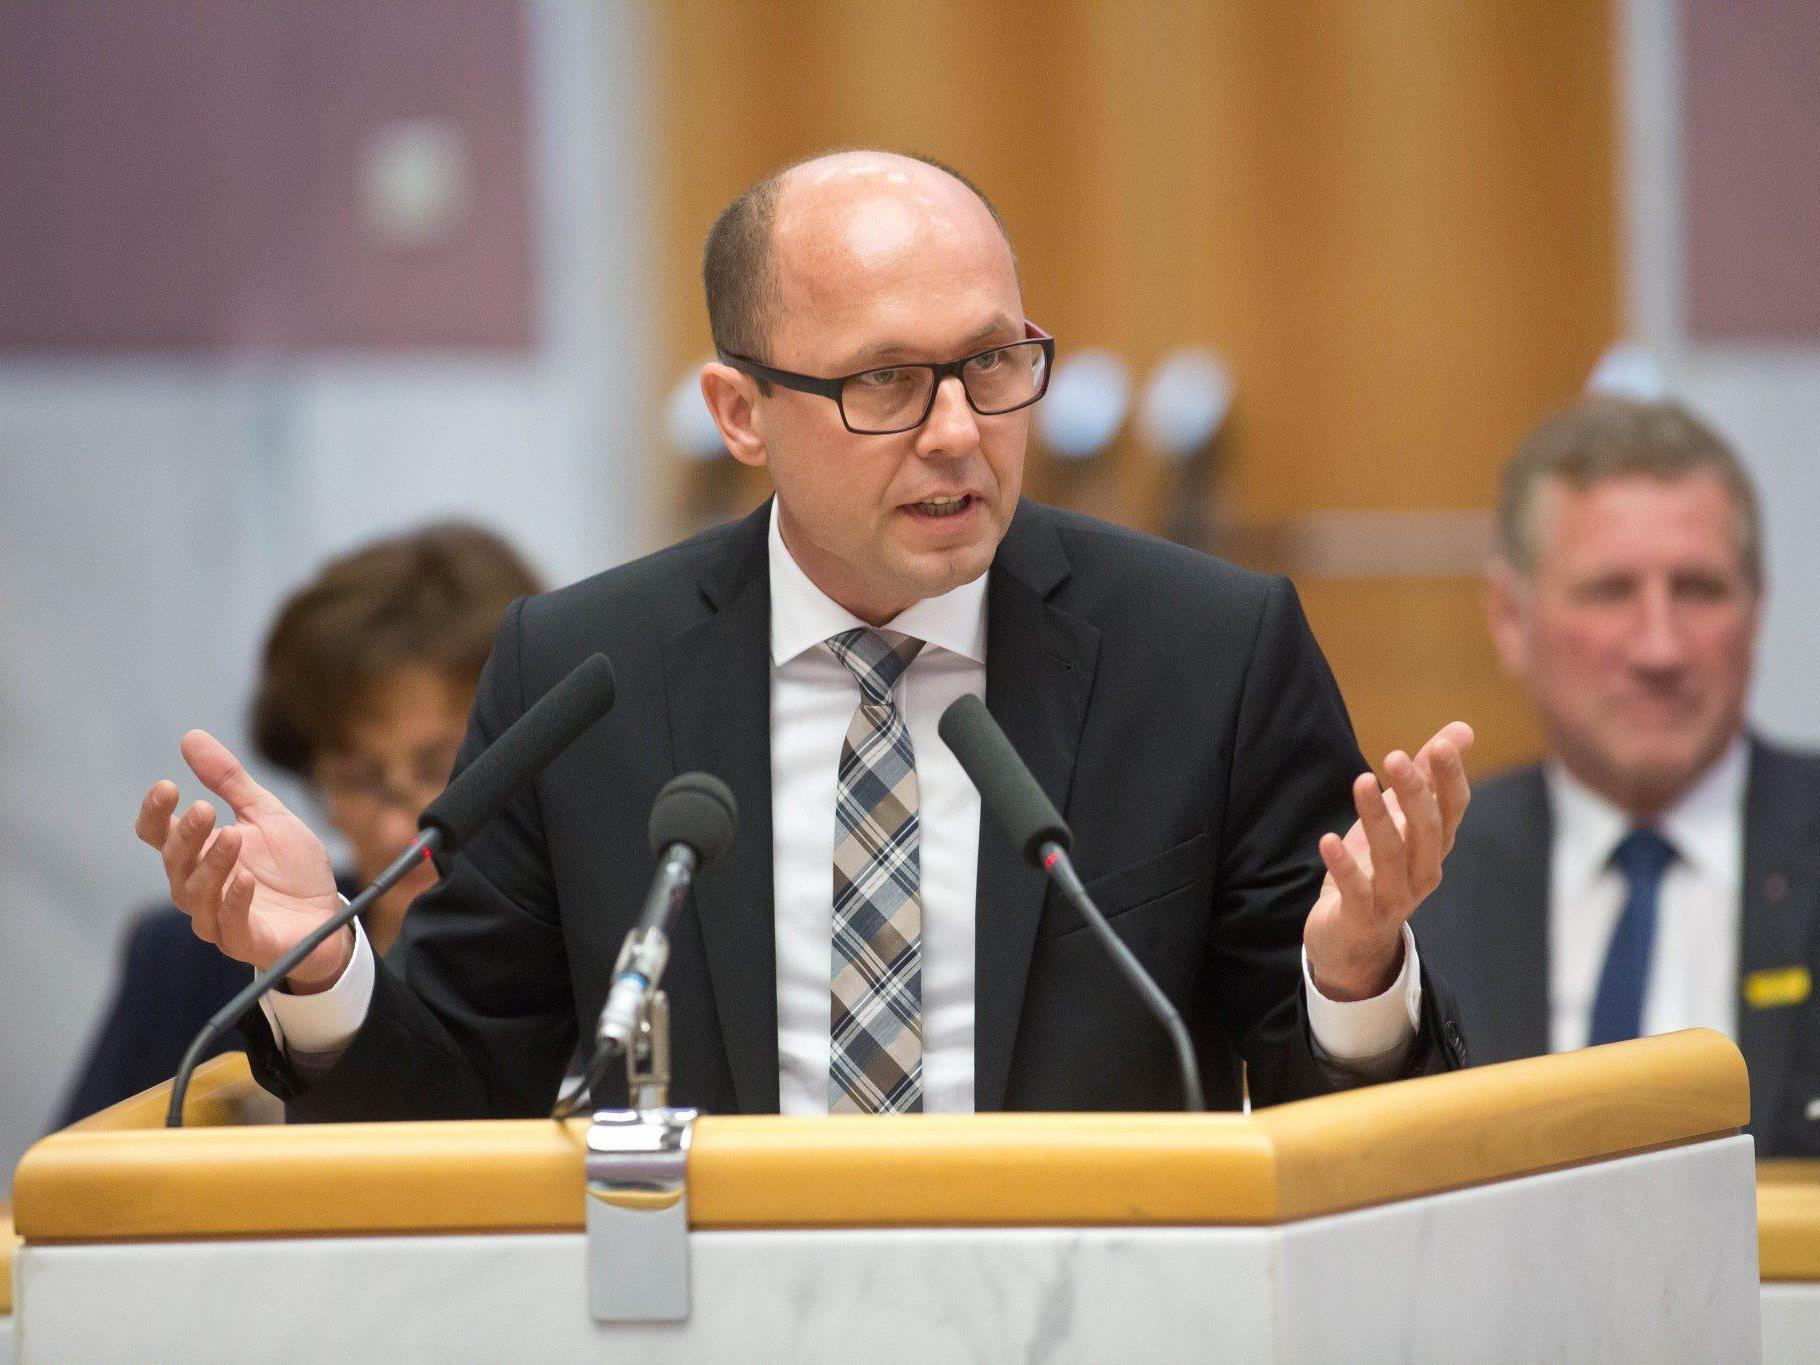 Bleibt ÖVP bei Steuerentlastung hart, will Ritsch den Koalitionspartner im Parlament übergehen.